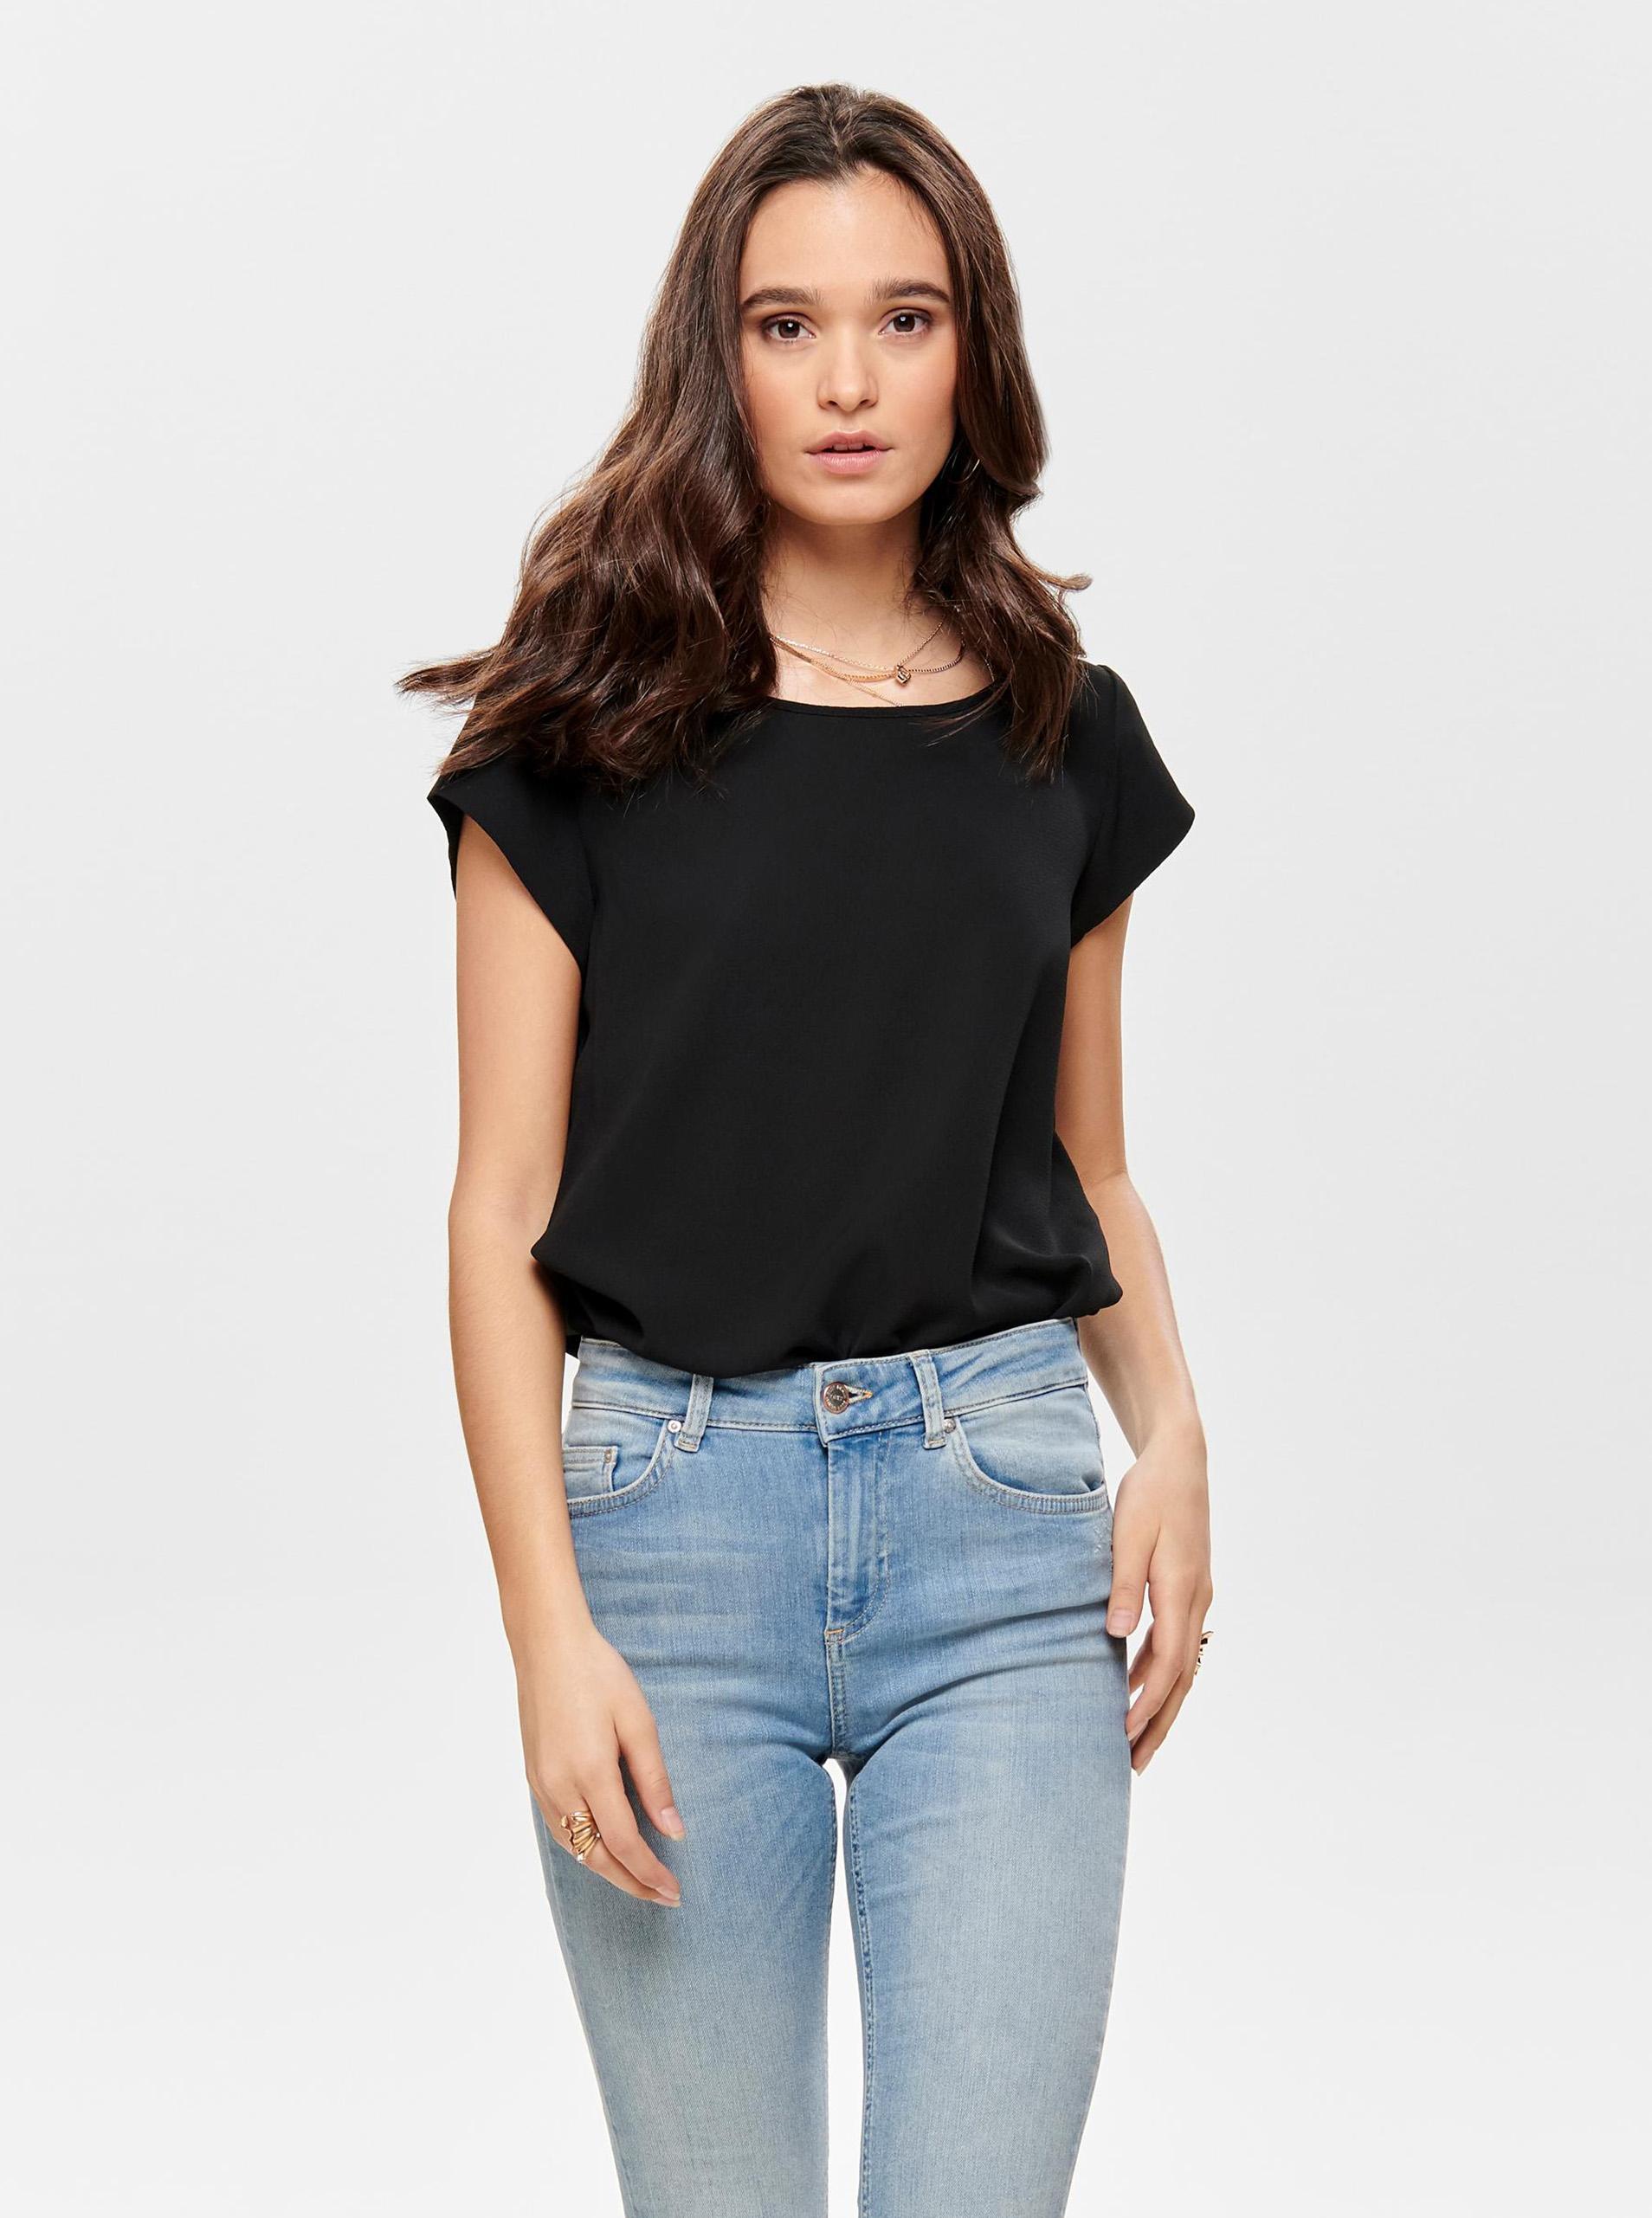 Crna bluza s patentnim zatvaračem na leđima ONLY Vic